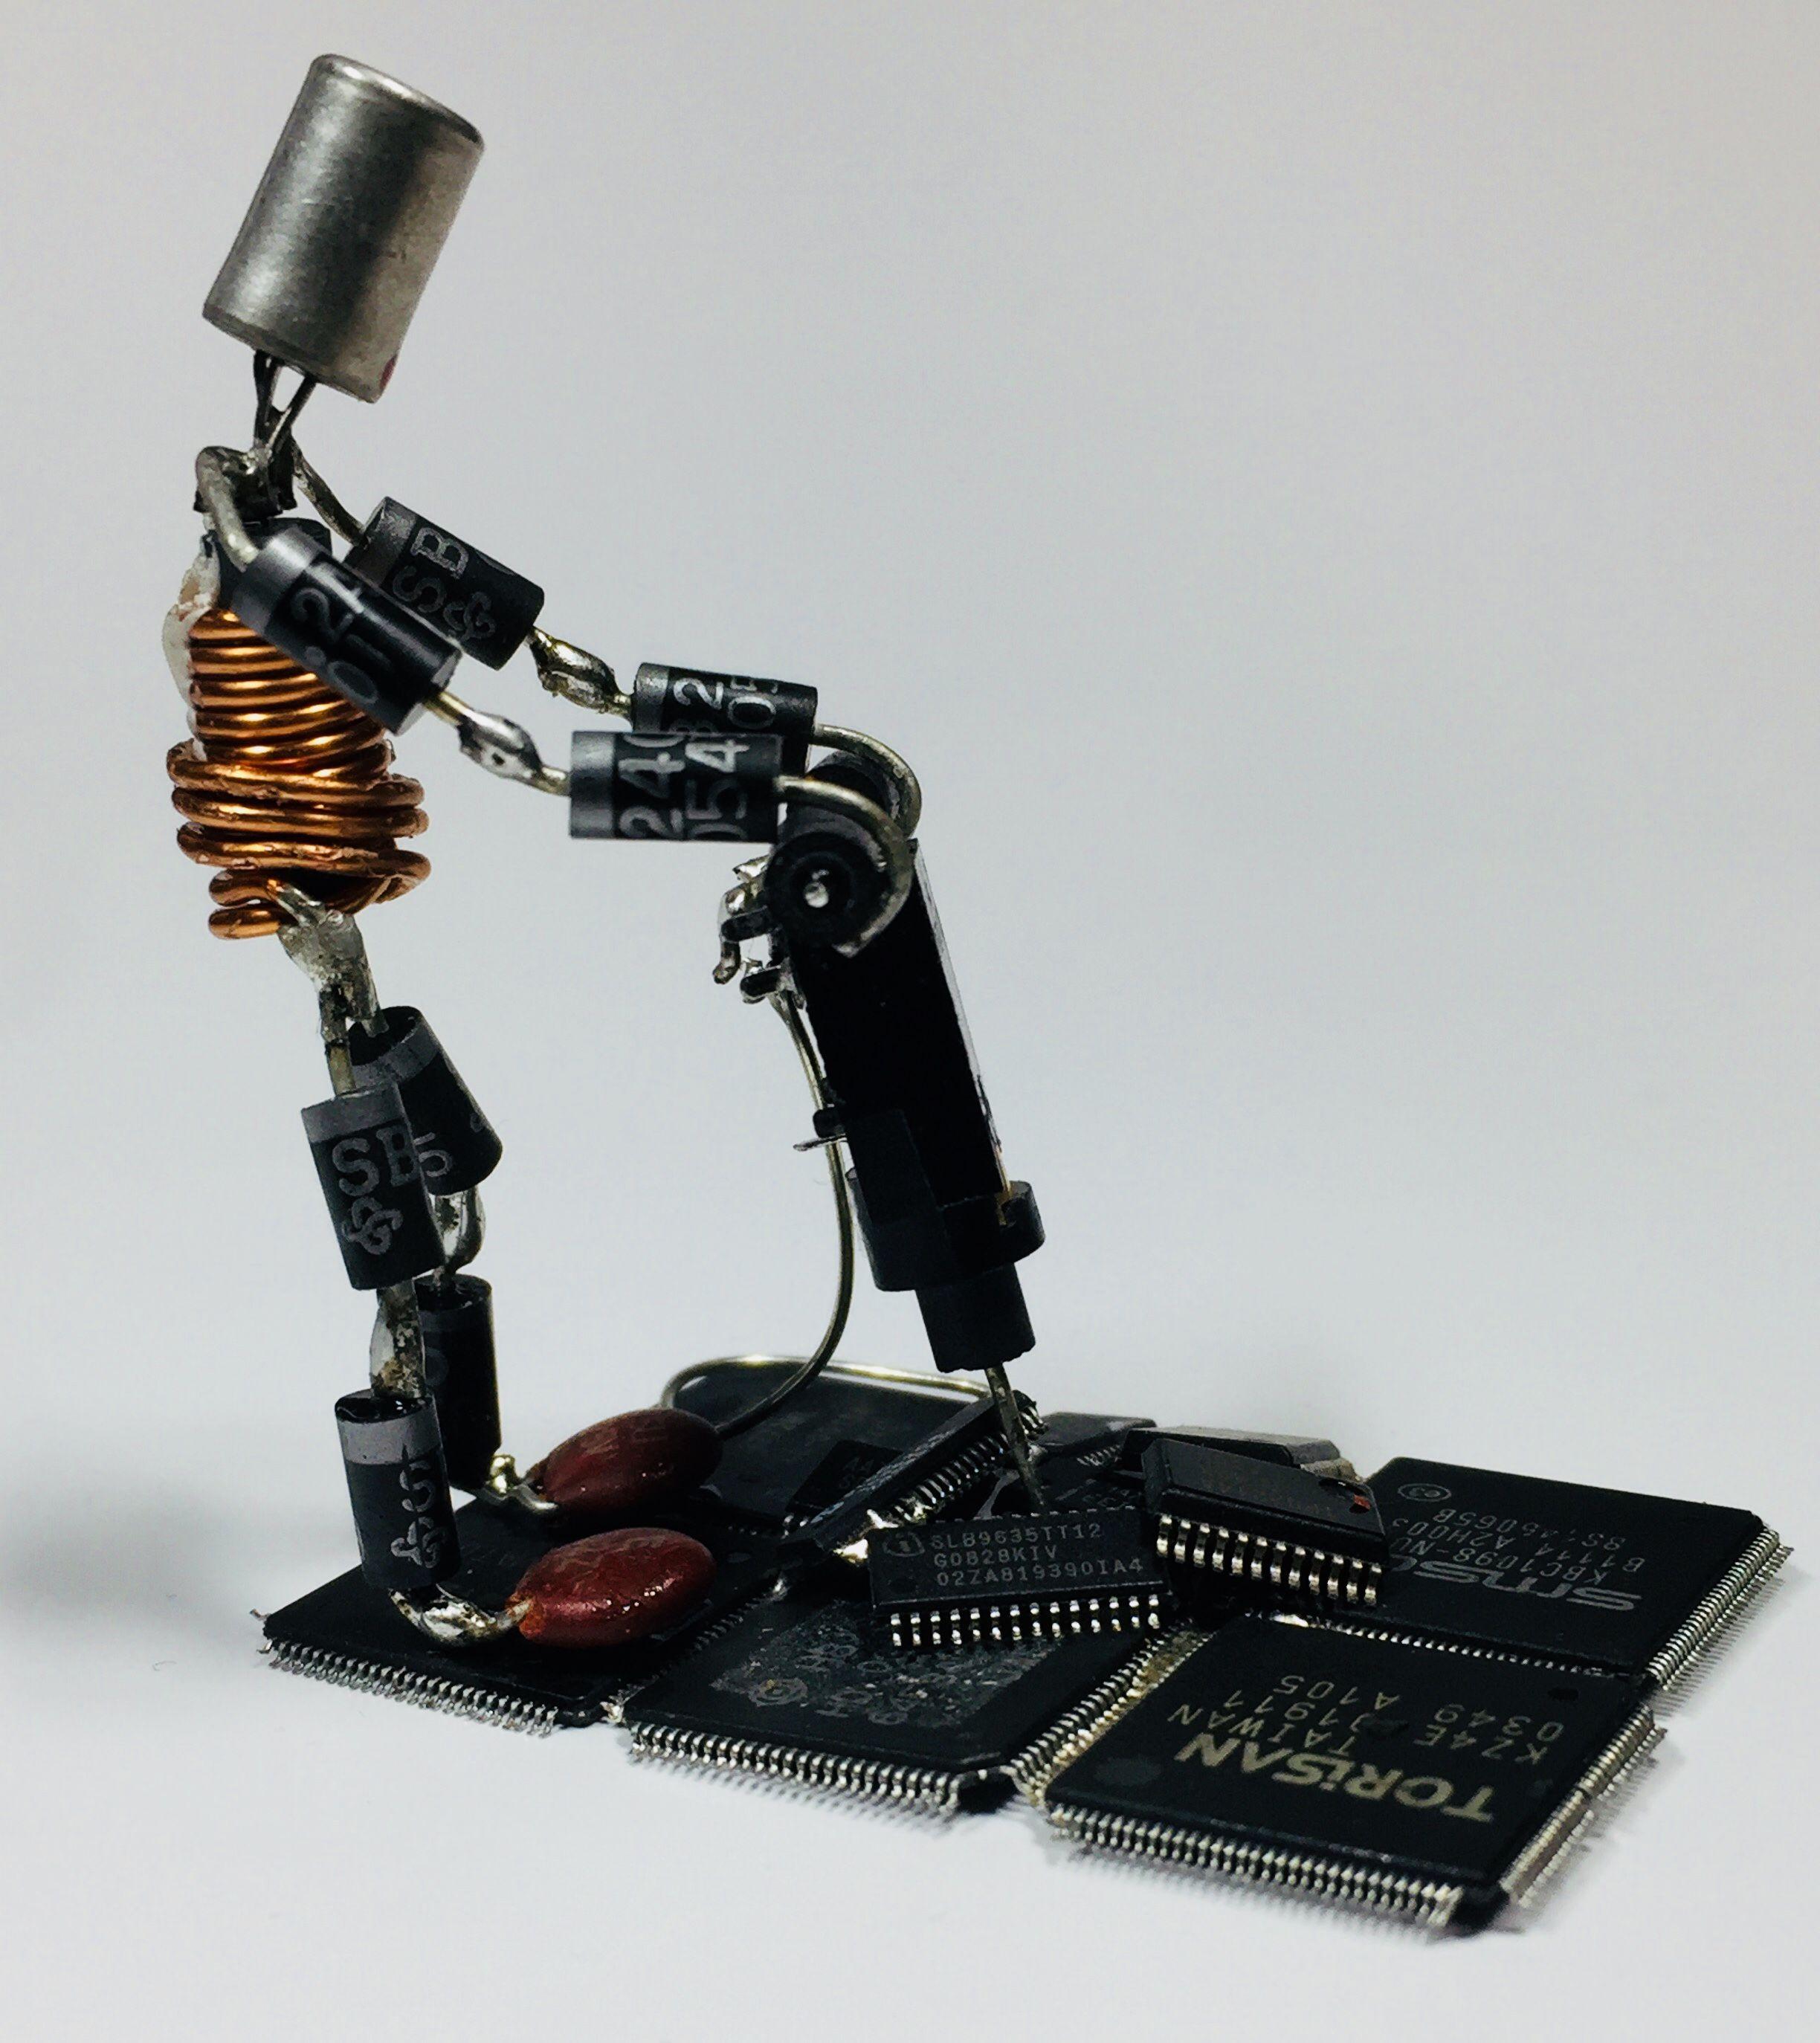 Pin by Jaco on Geek stuff Electronic art, Engineering